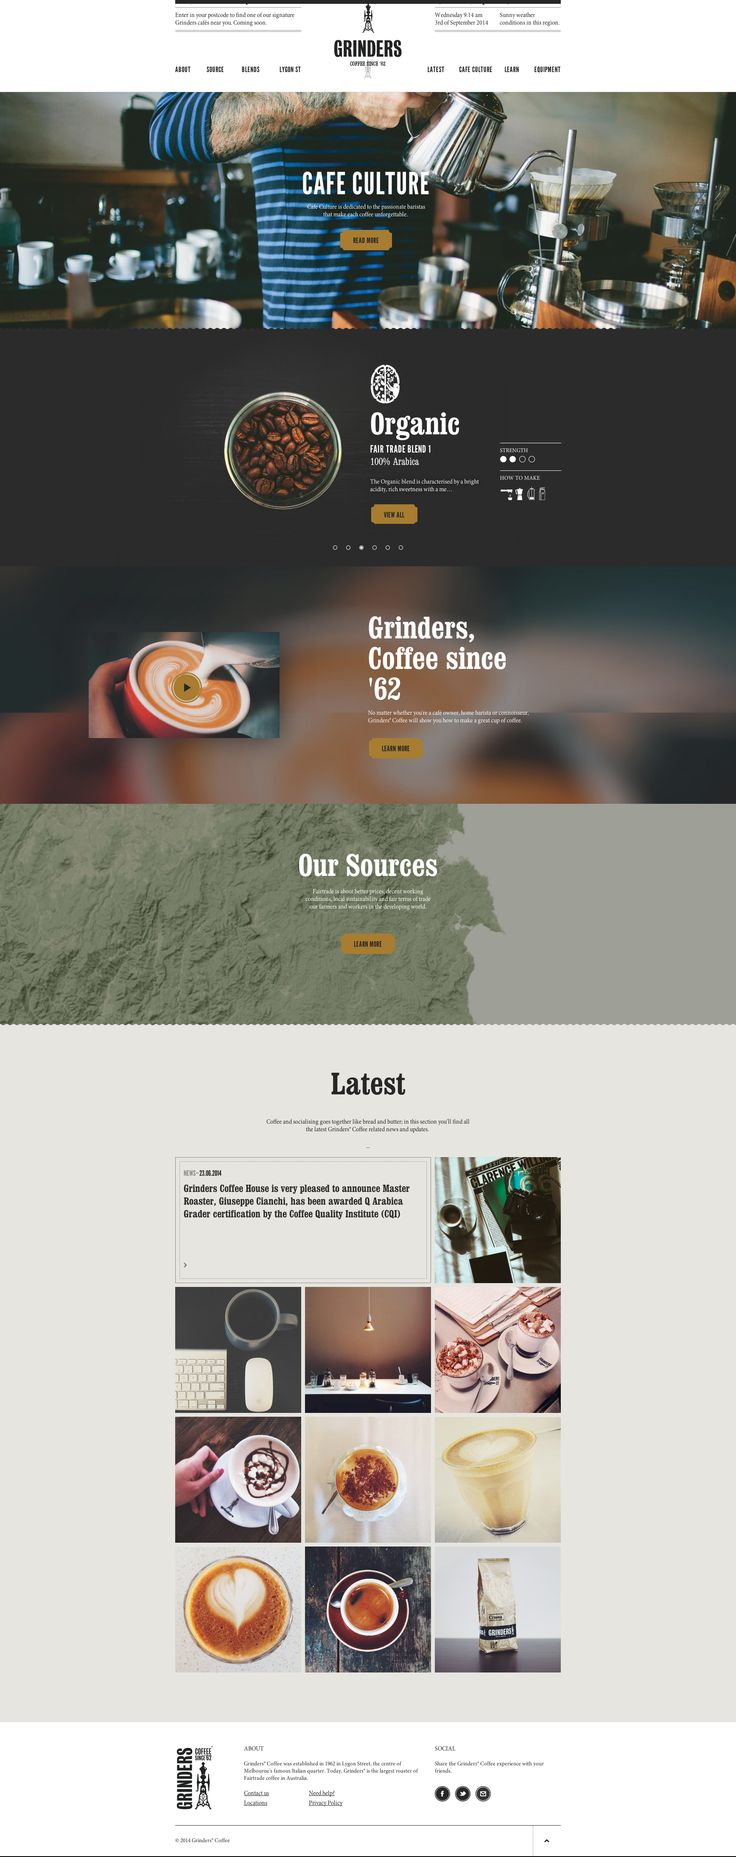 http://grinderscoffeehouse.com.au/